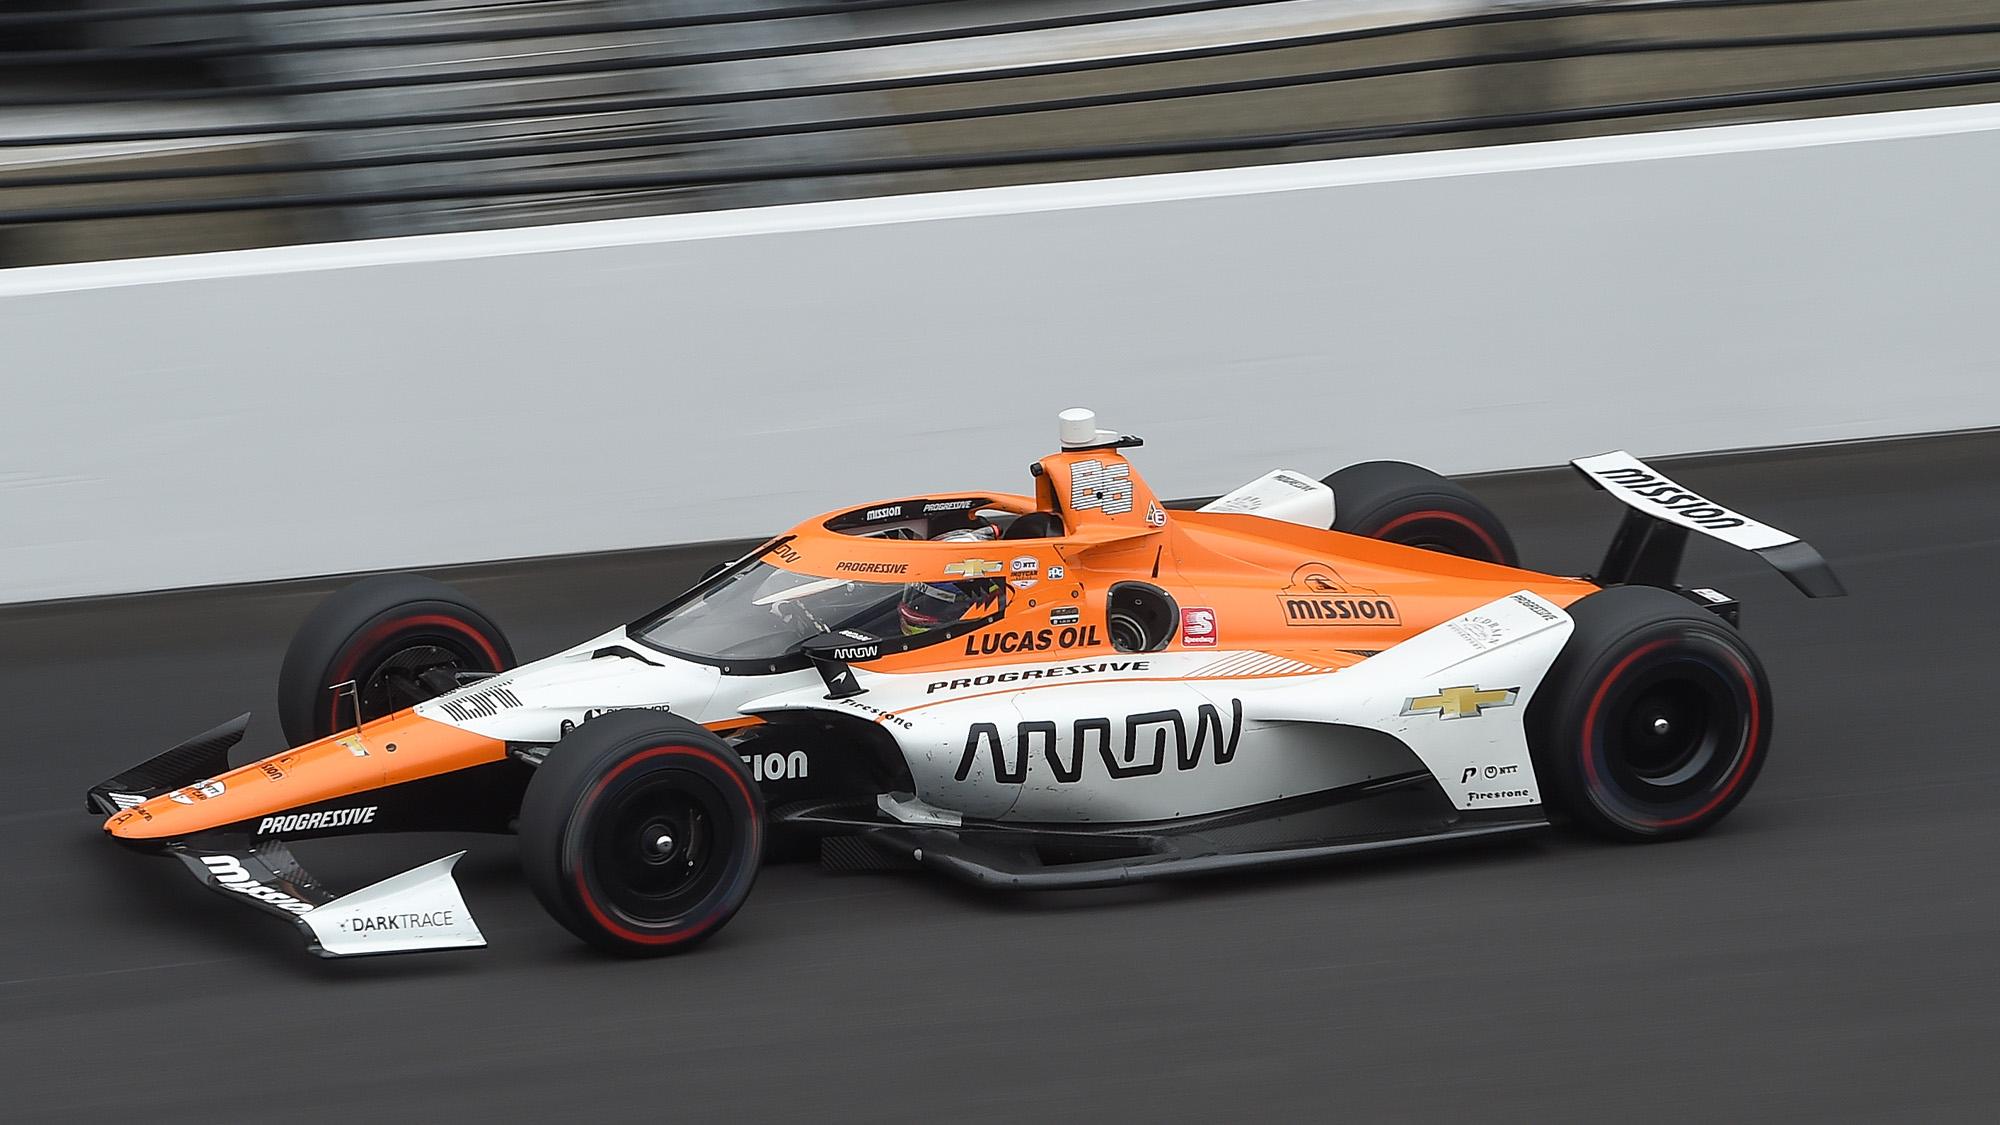 Arrows McLaren SP of Juan Pablo Montoya at indianapolis 2021